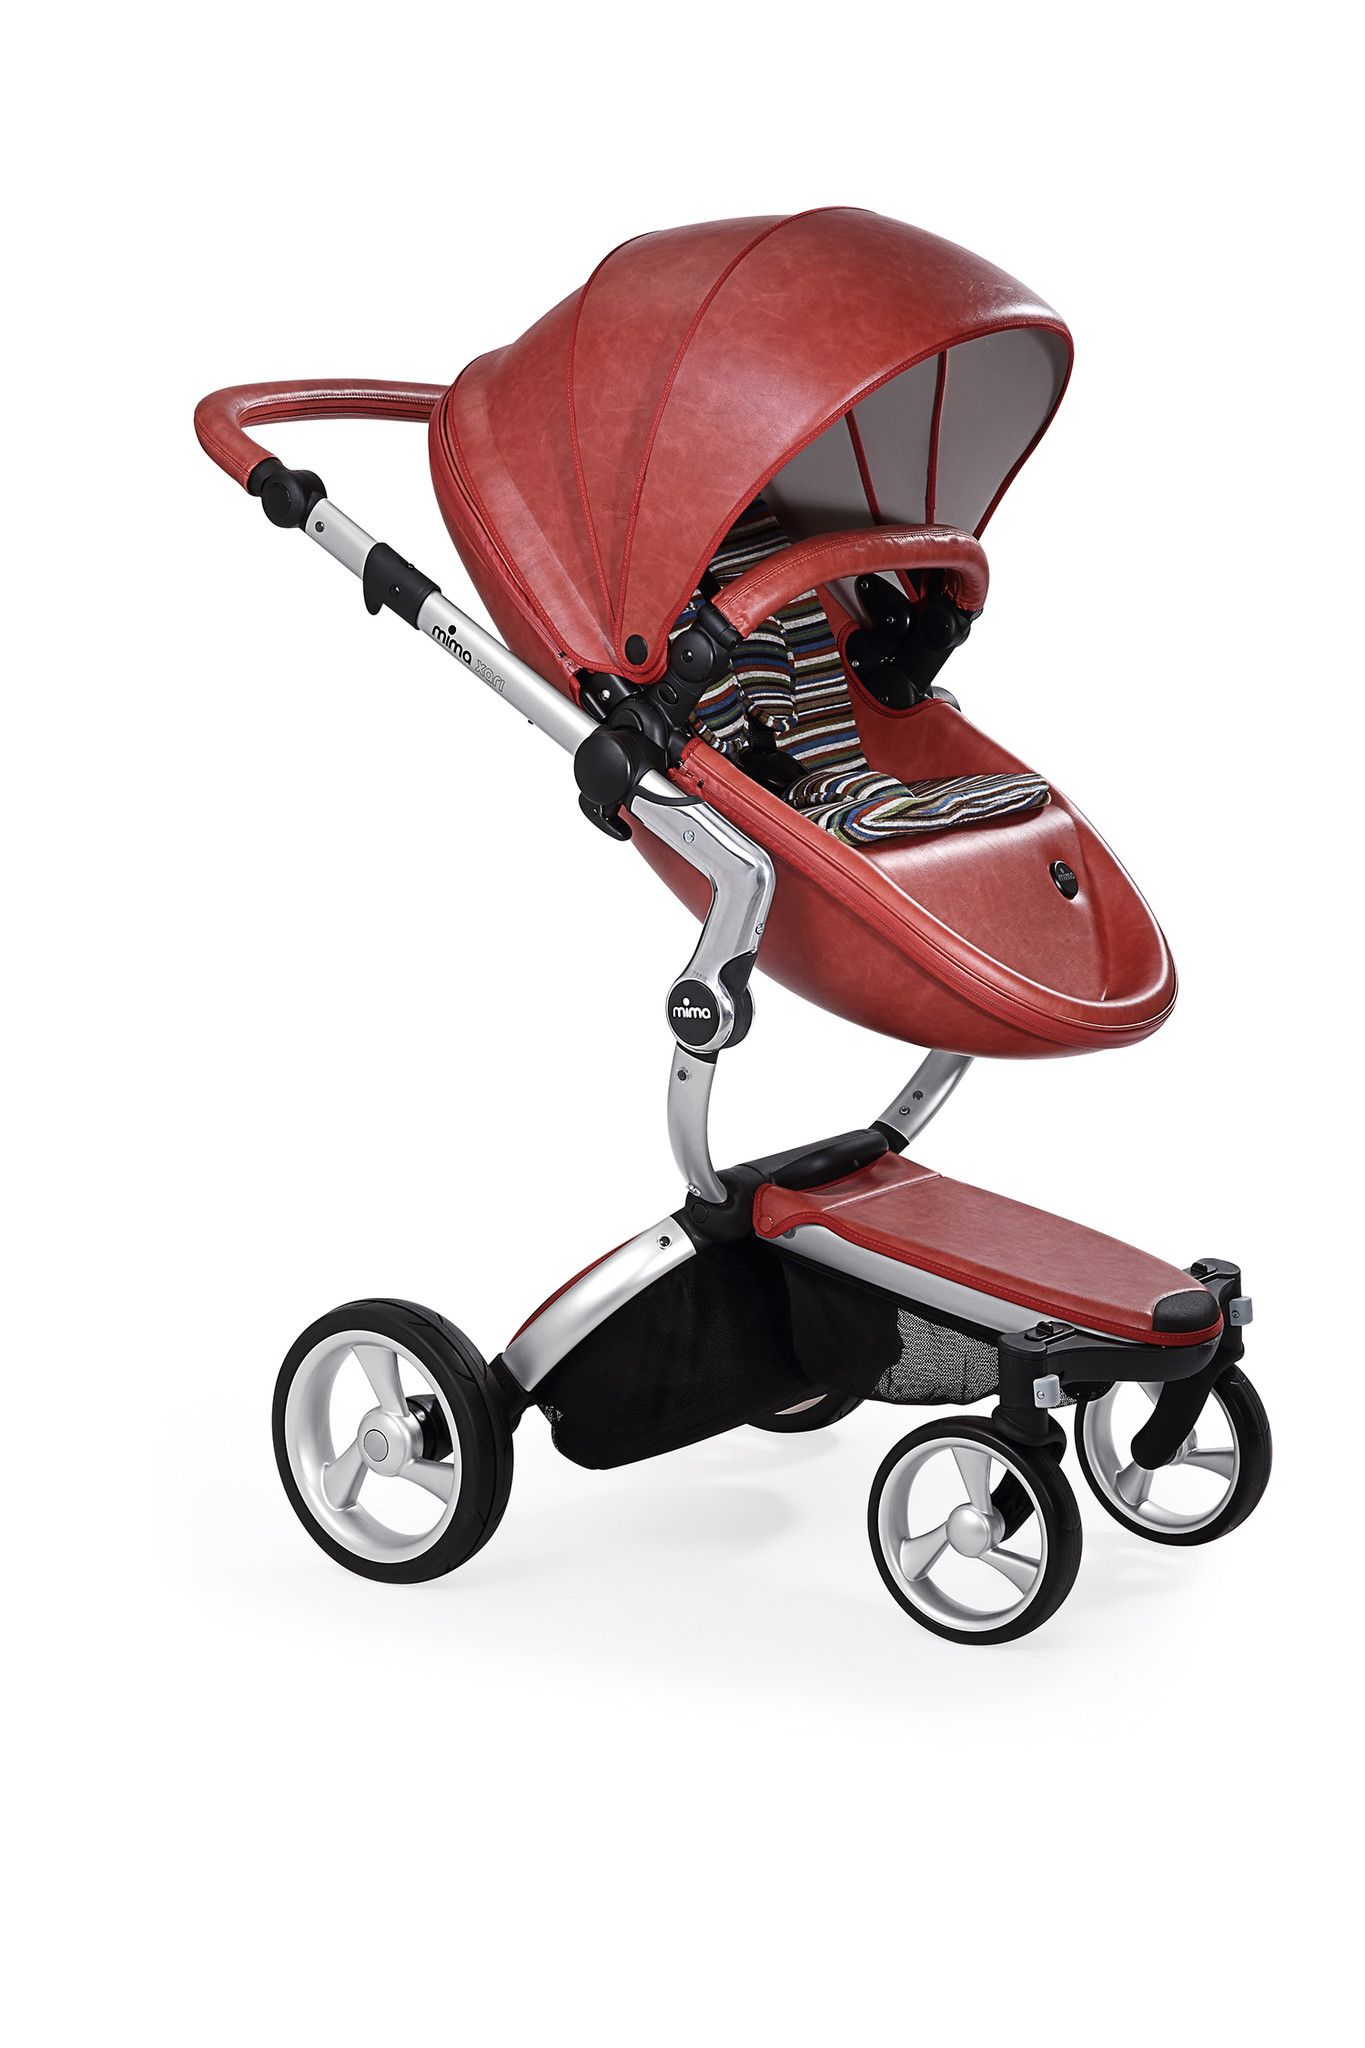 Mima Xari Stroller Silver Frame Mima xari stroller